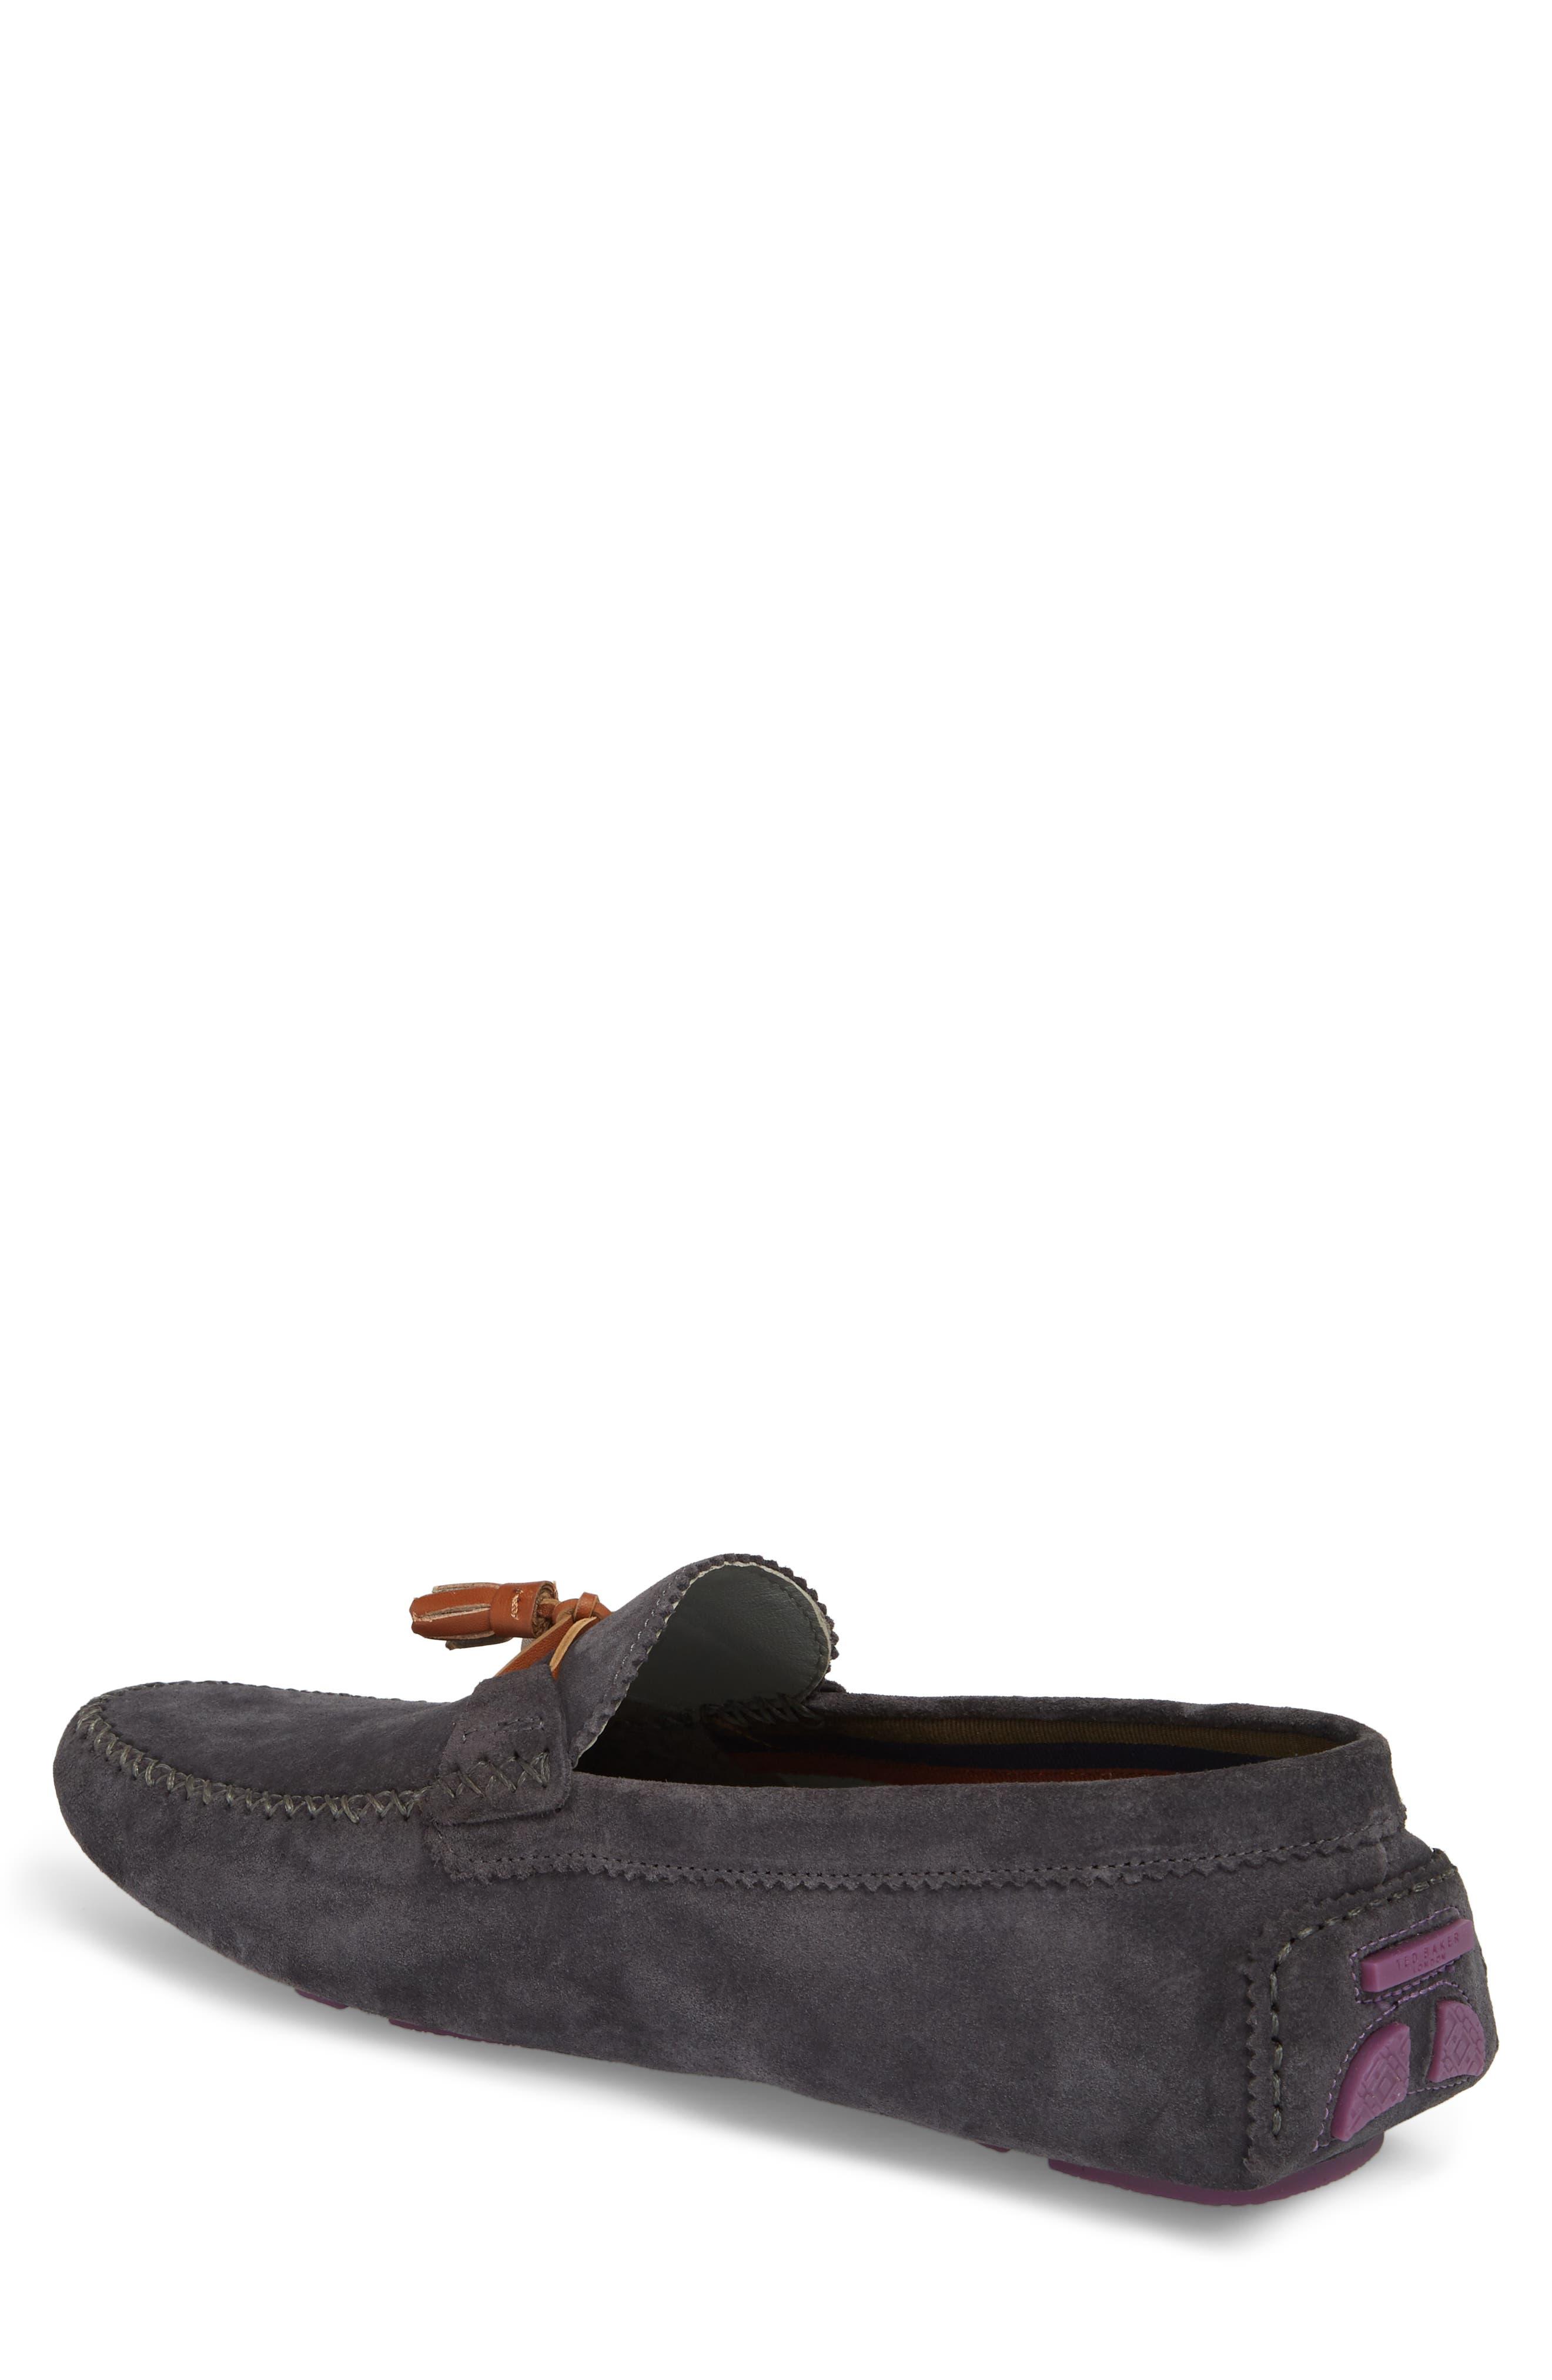 Urbonns Tasseled Driving Loafer,                             Alternate thumbnail 2, color,                             070